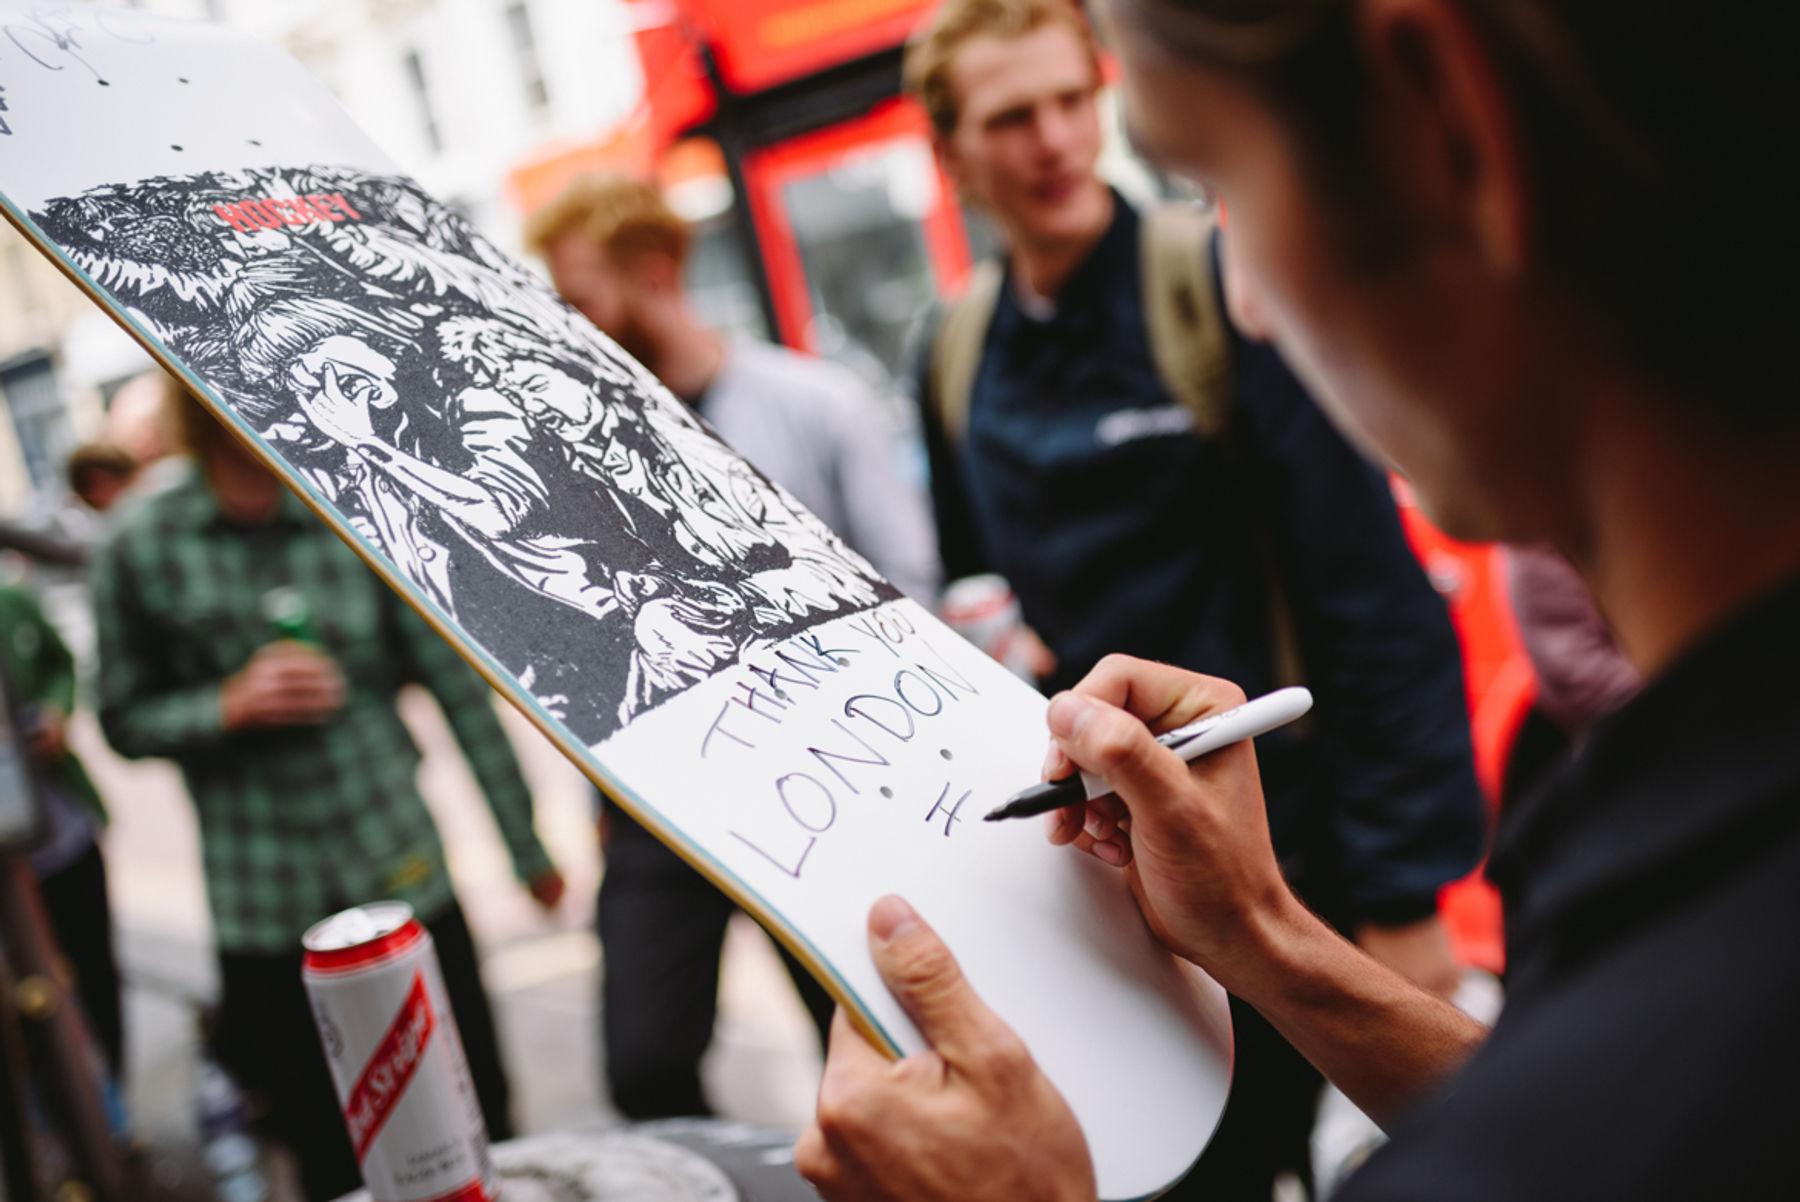 _IHC7182e-Donovon-Piscopo-John-Fitzgerald-Nike-SB-x-Slam-City-Skates-Go-Skateboarding-Day-London-June-2015-Photographer-Maksim-Kalanep